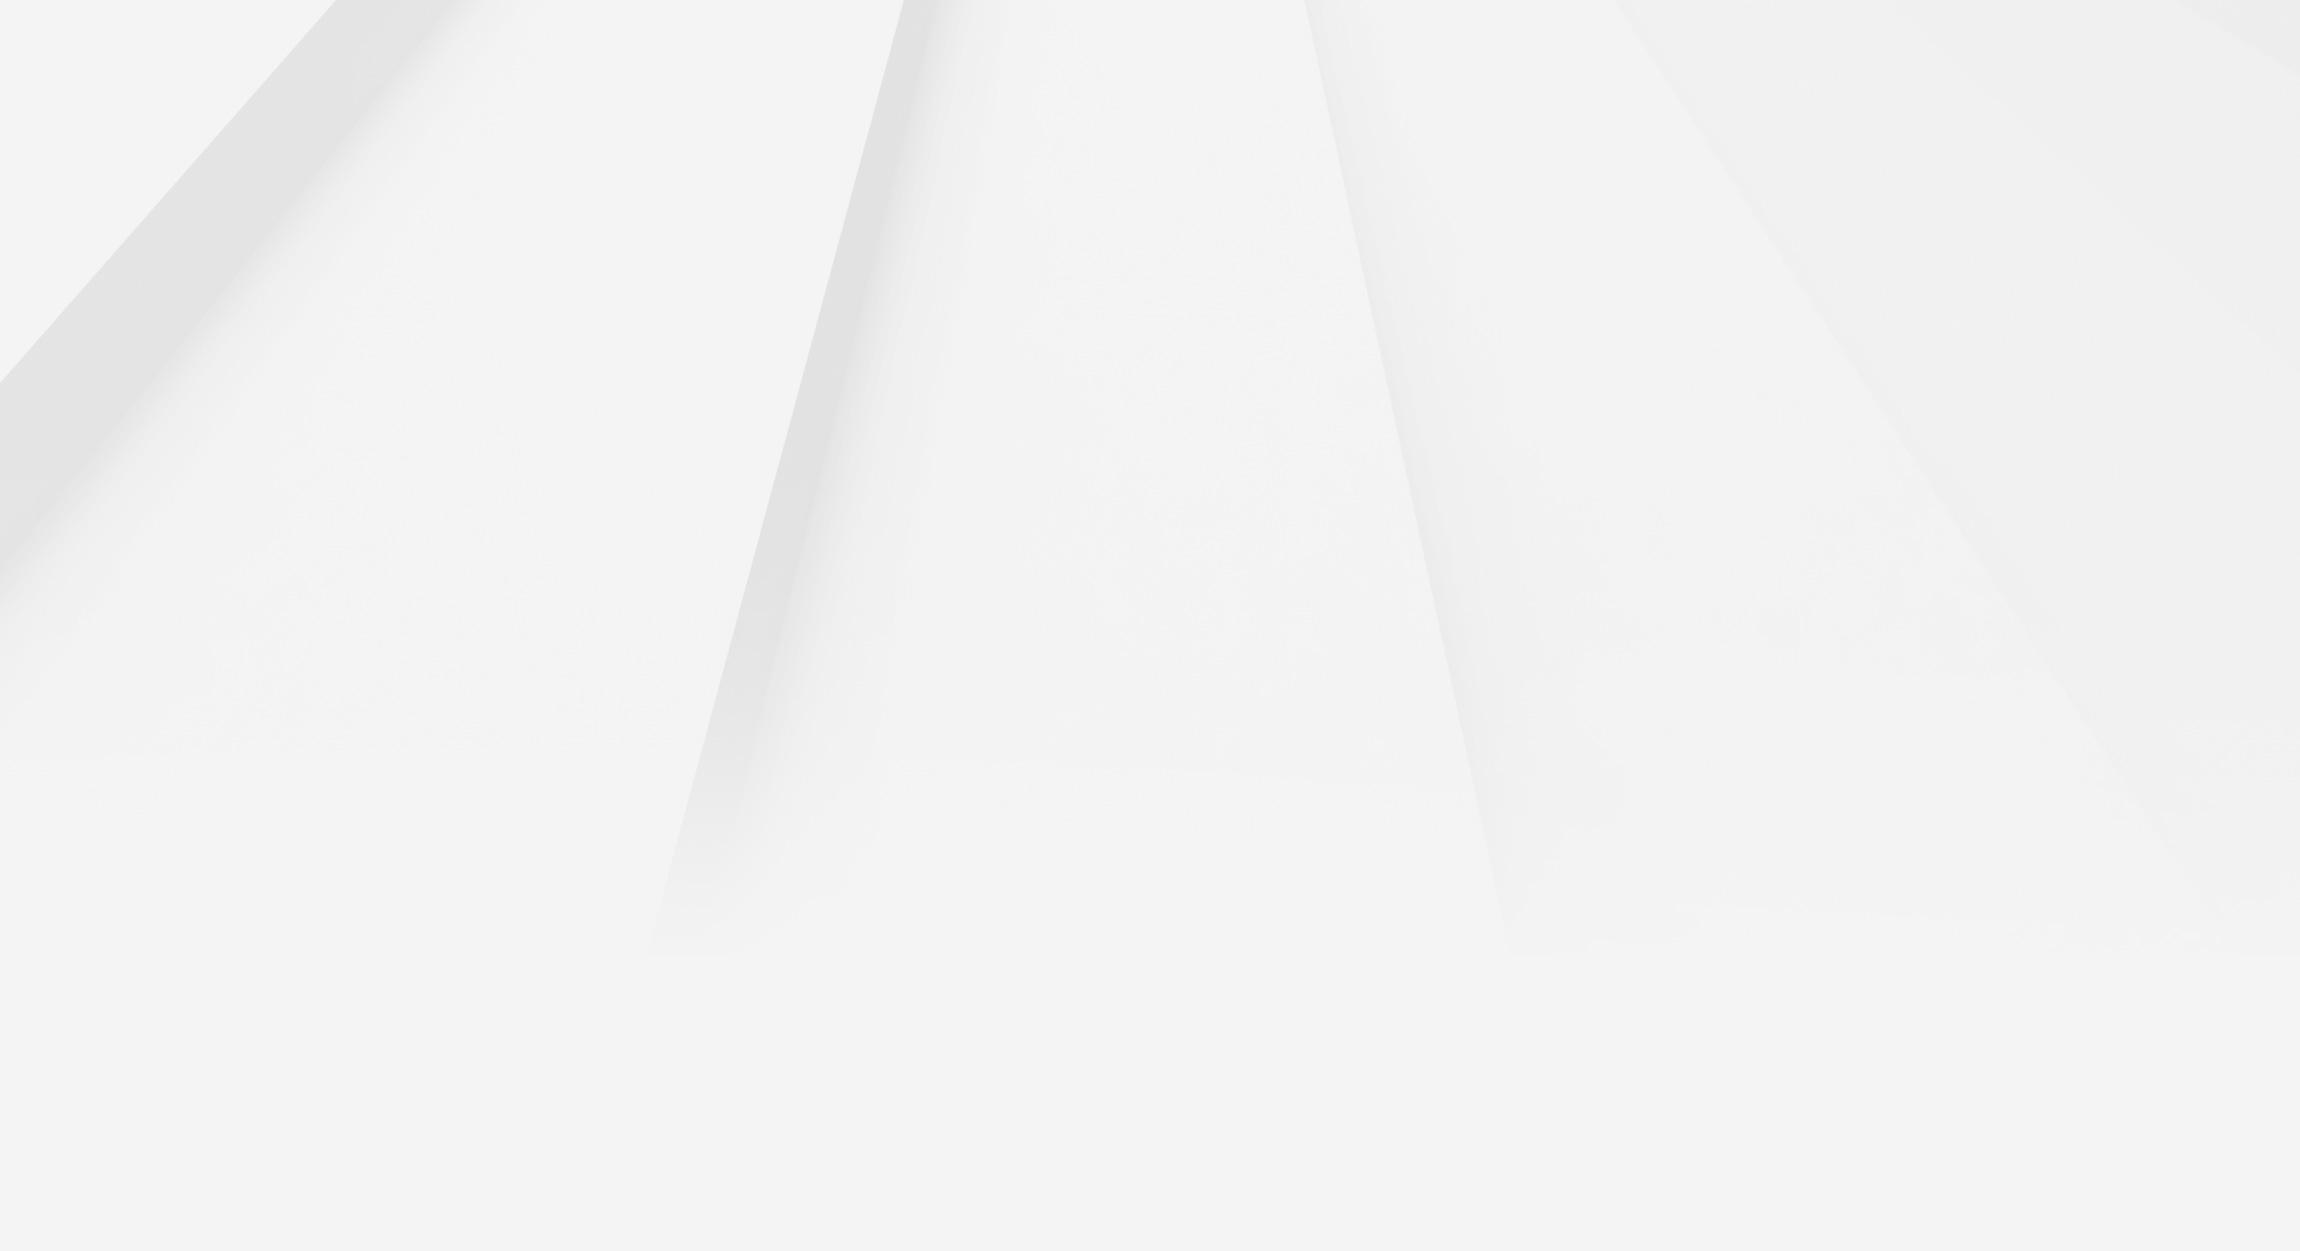 geometic-bg-white-2